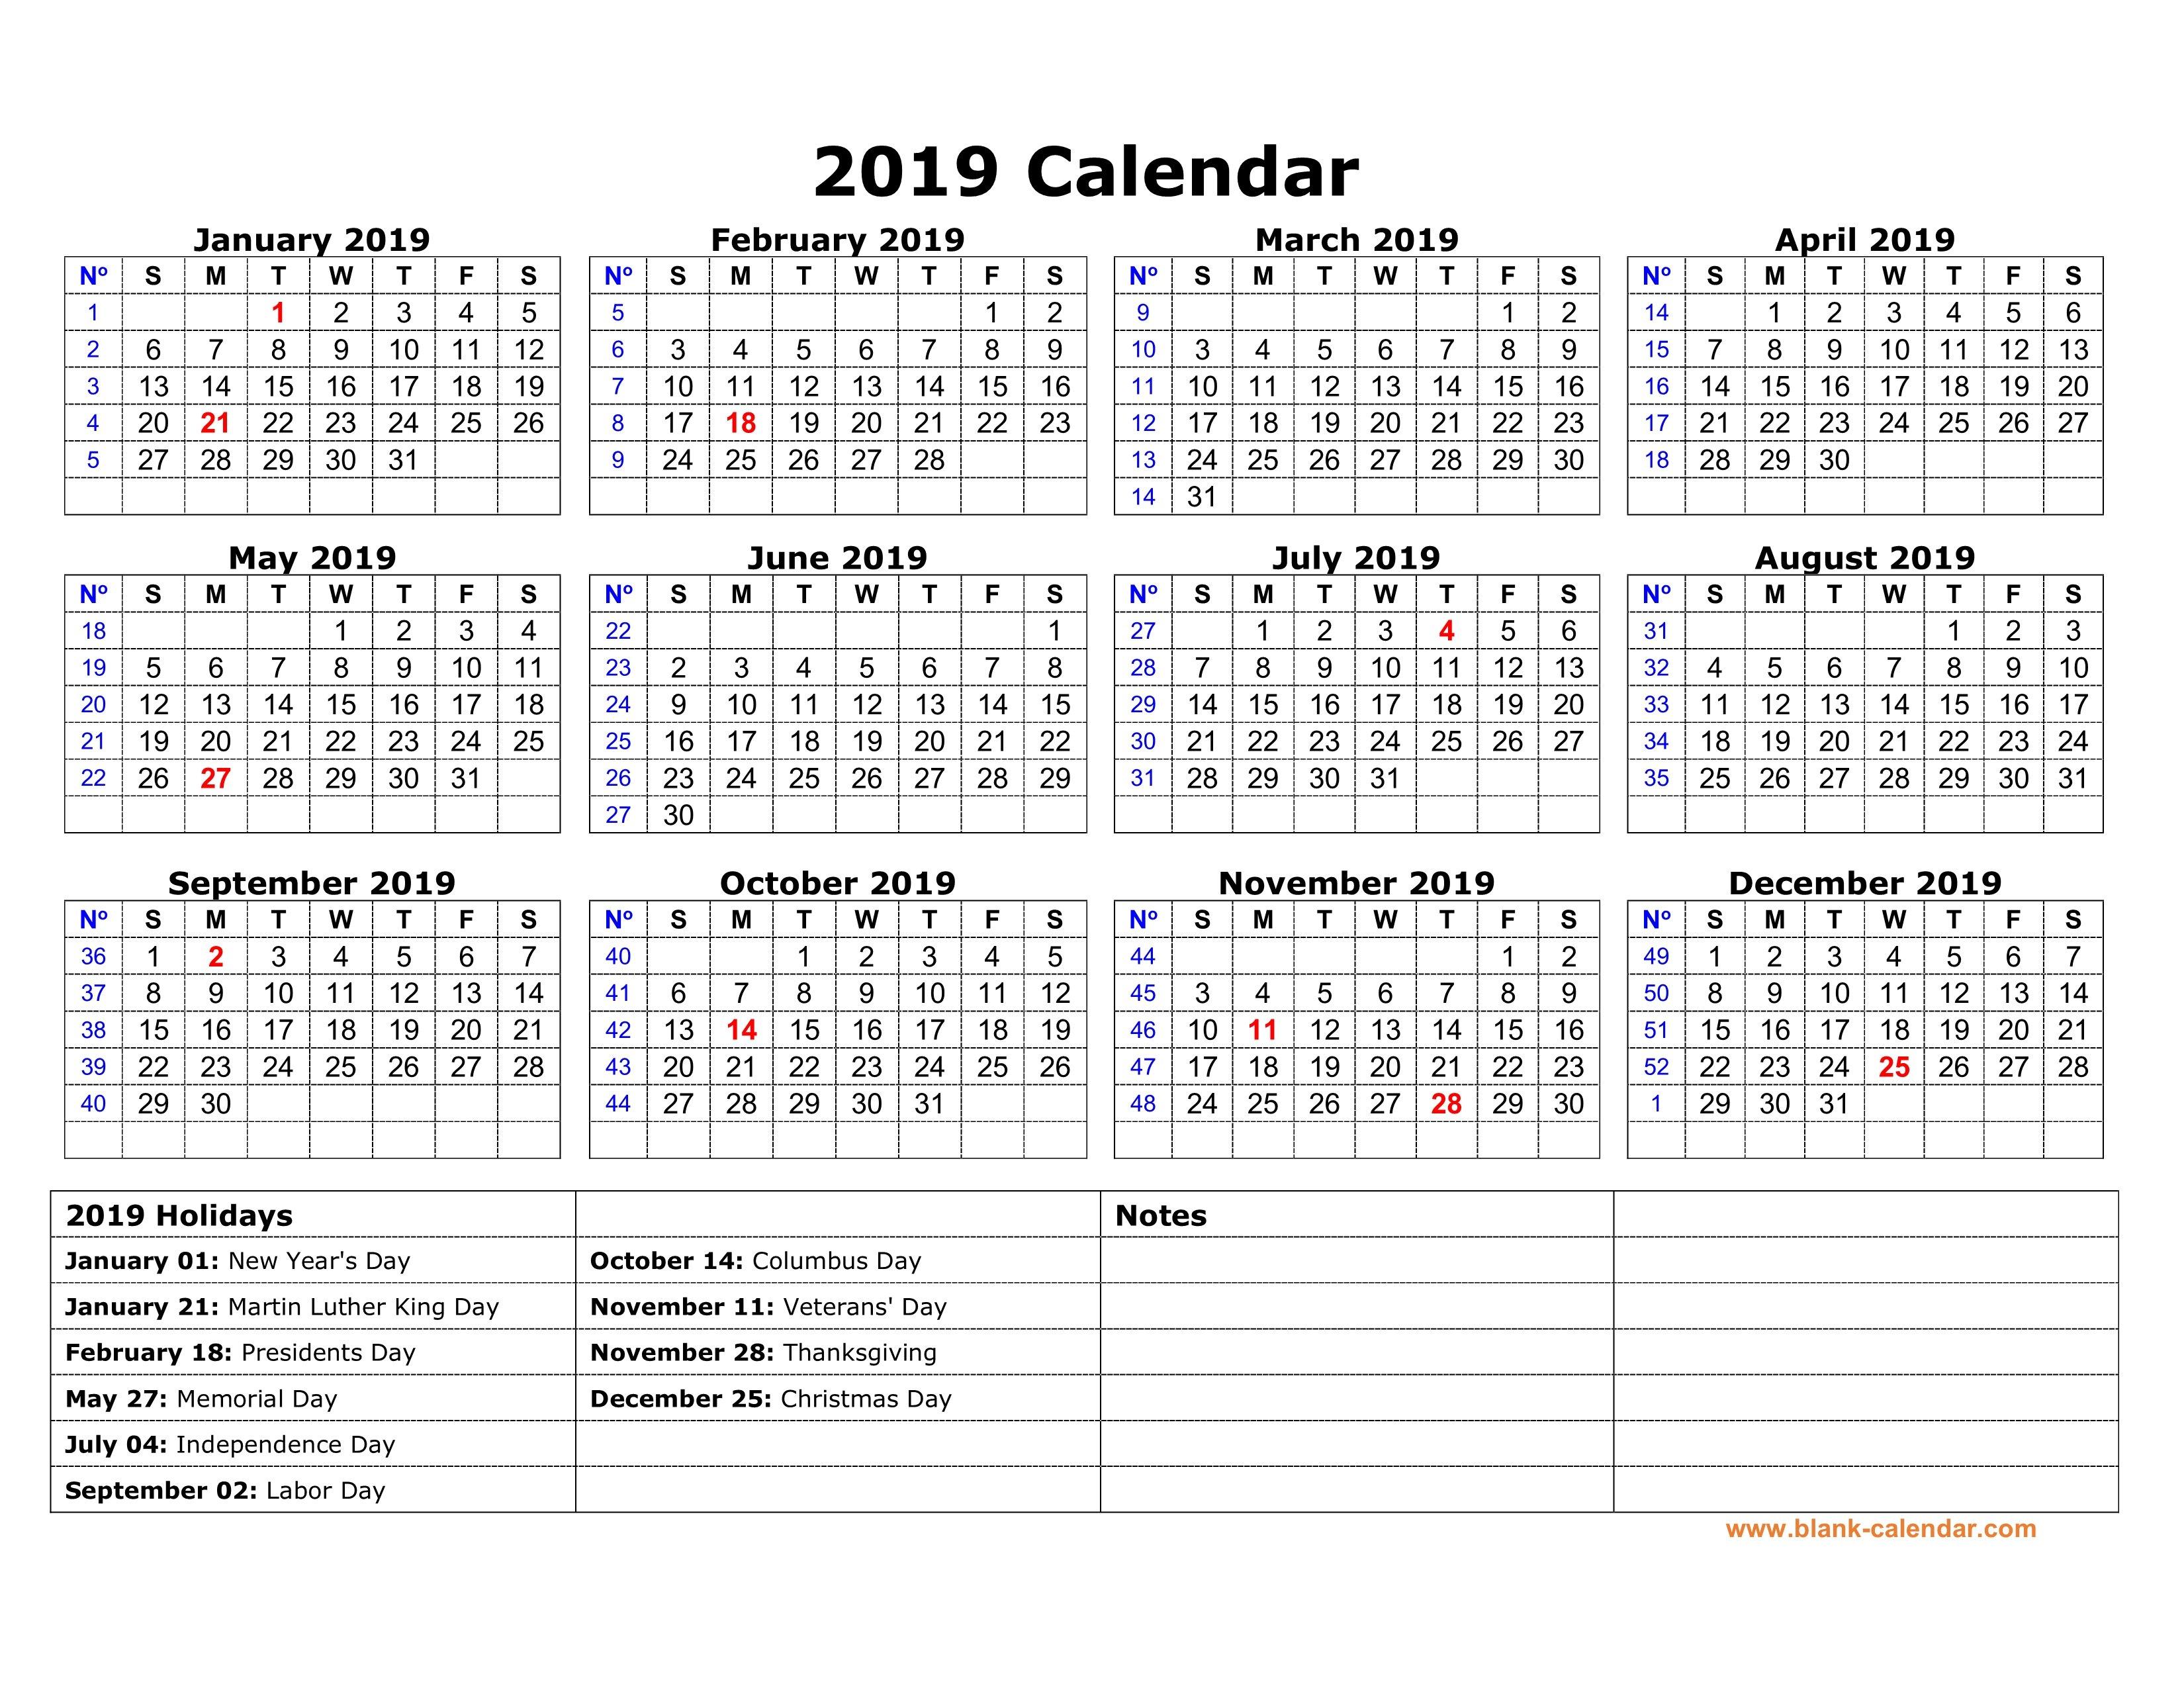 Free Download Printable Calendar 2019 With Us Federal Holidays, One Calendar 2019 Holidays